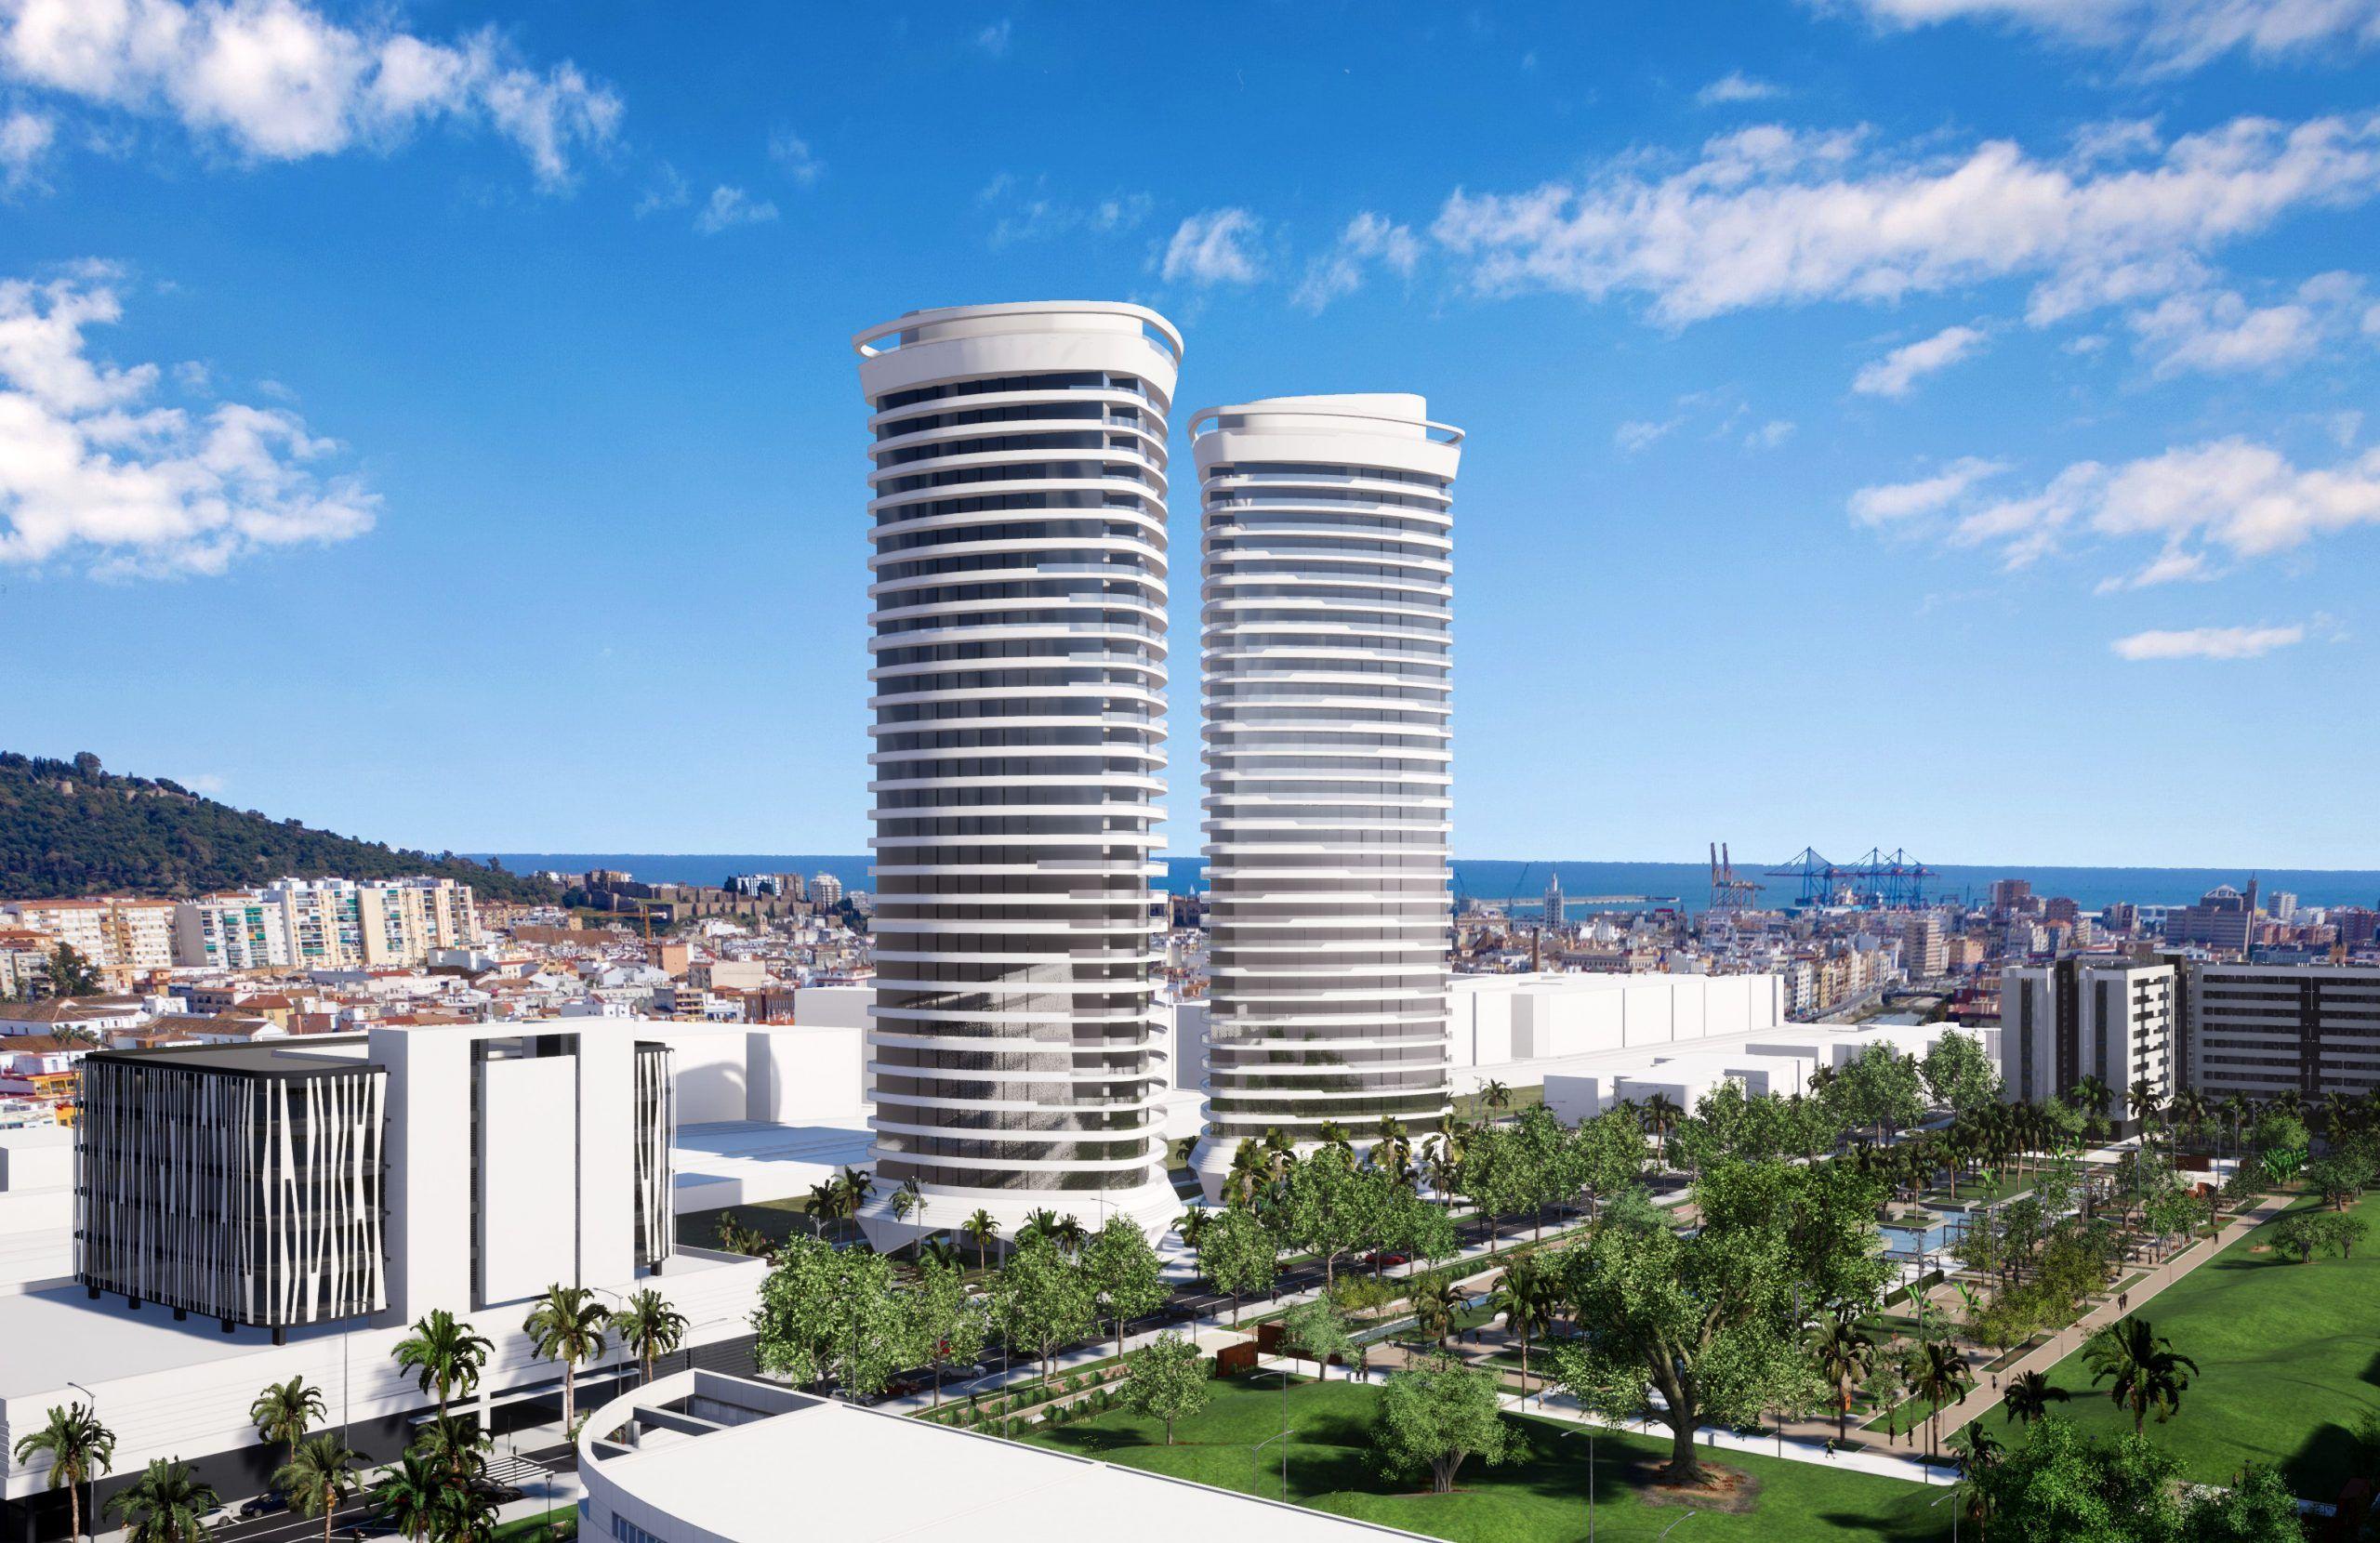 Anteproyecto de 450 viviendas en Torres Martiricos Malaga